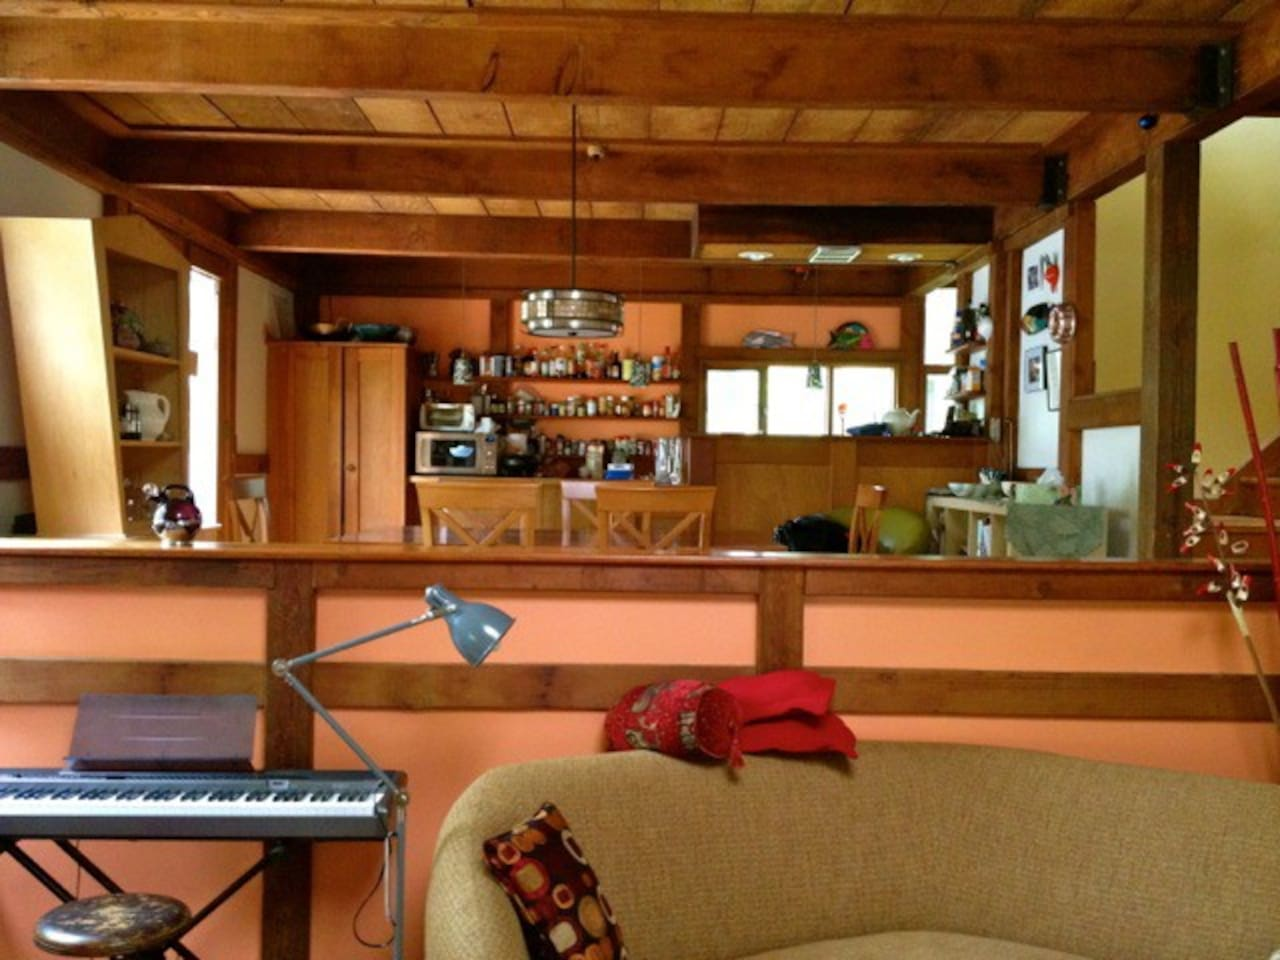 Kitchen, digital piano.